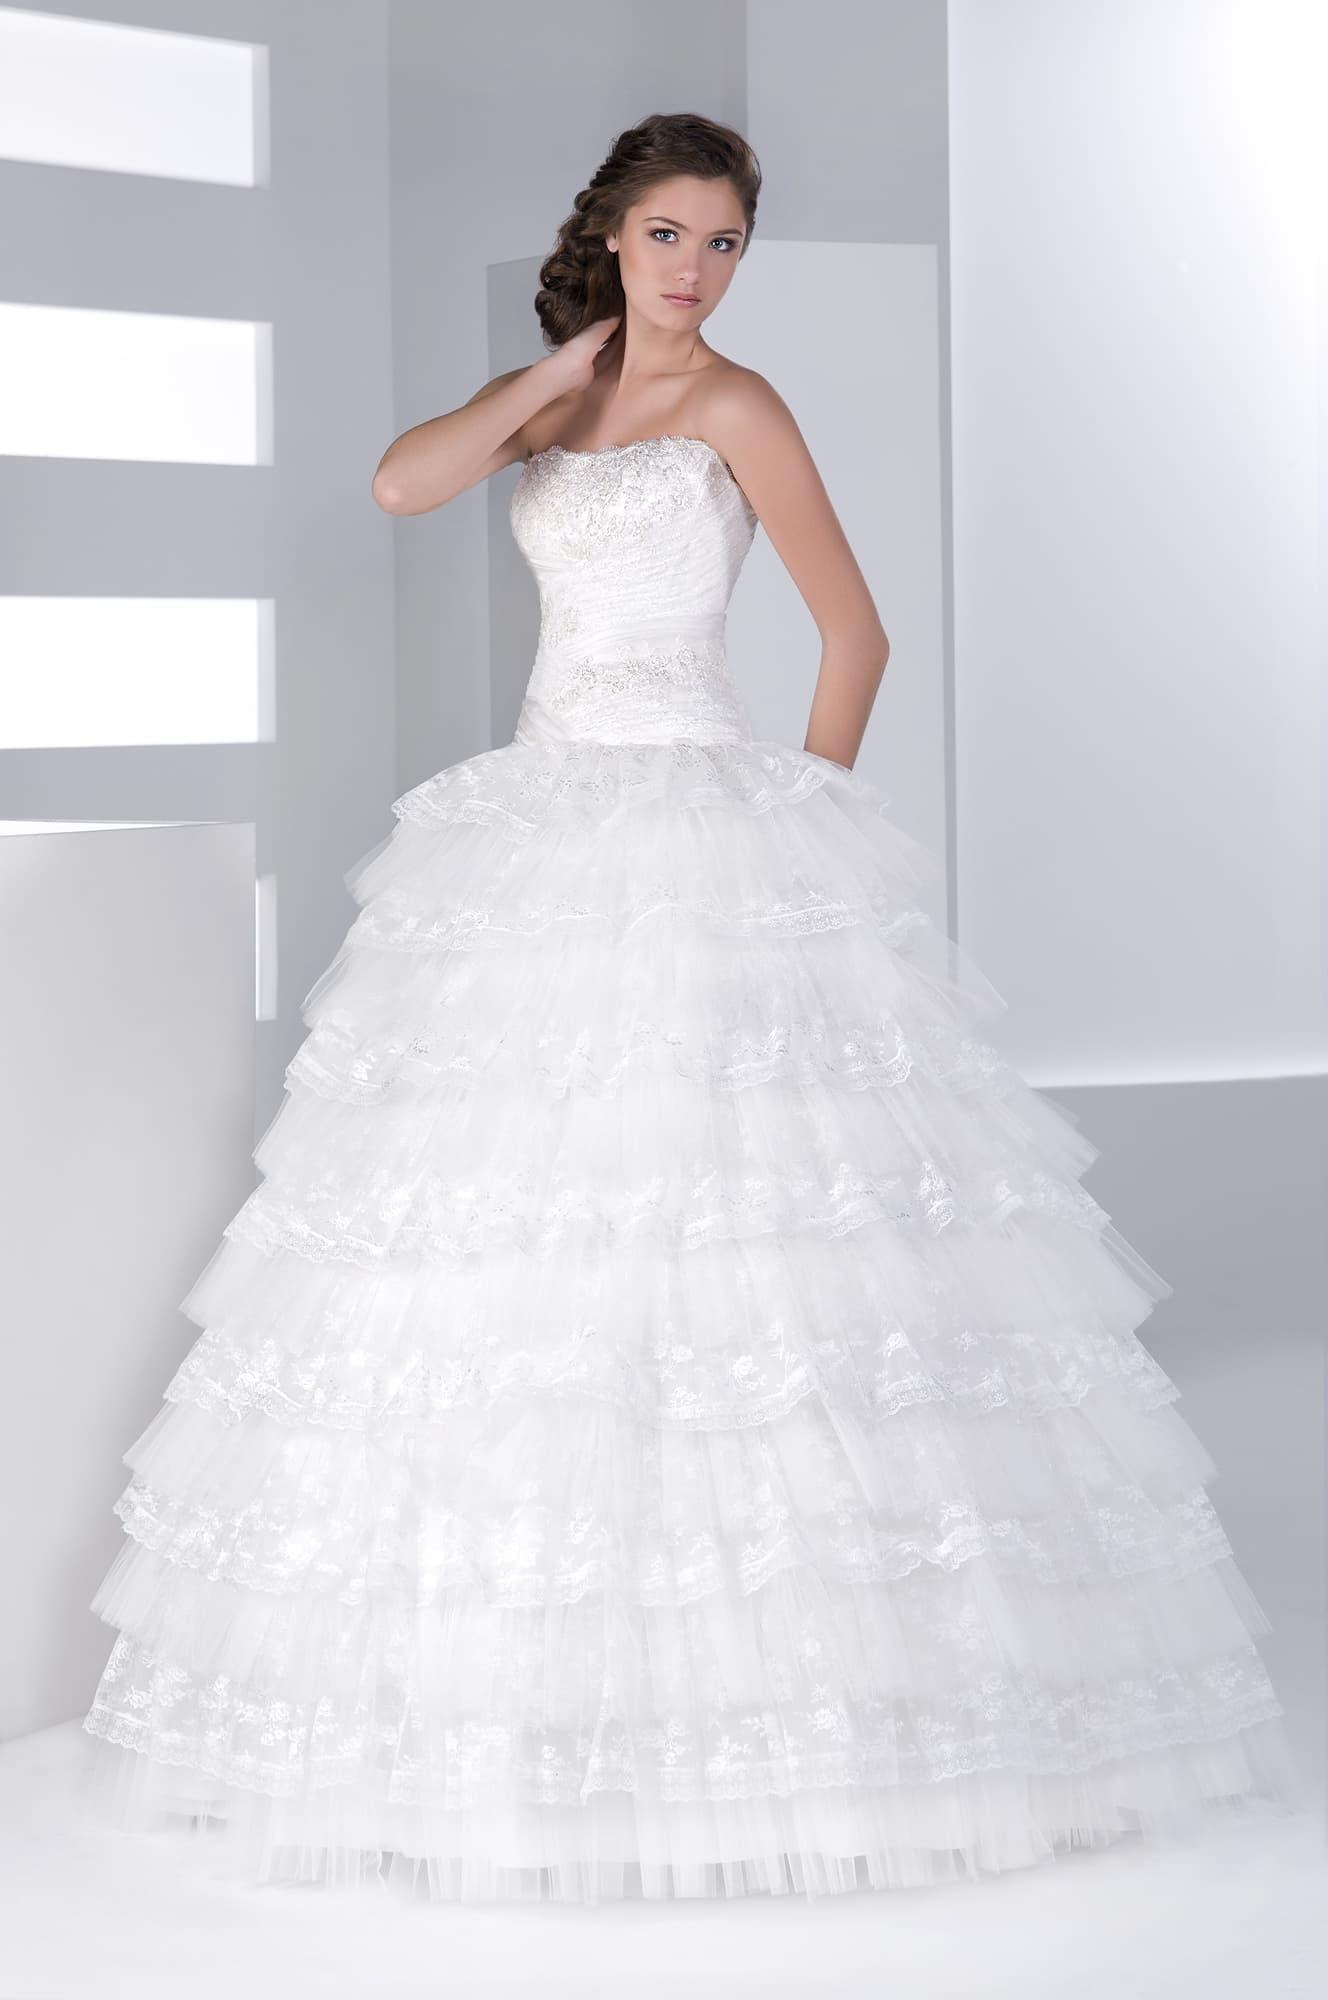 Gabbiano Кейси | Свадебный салон Валенсия | Search Results